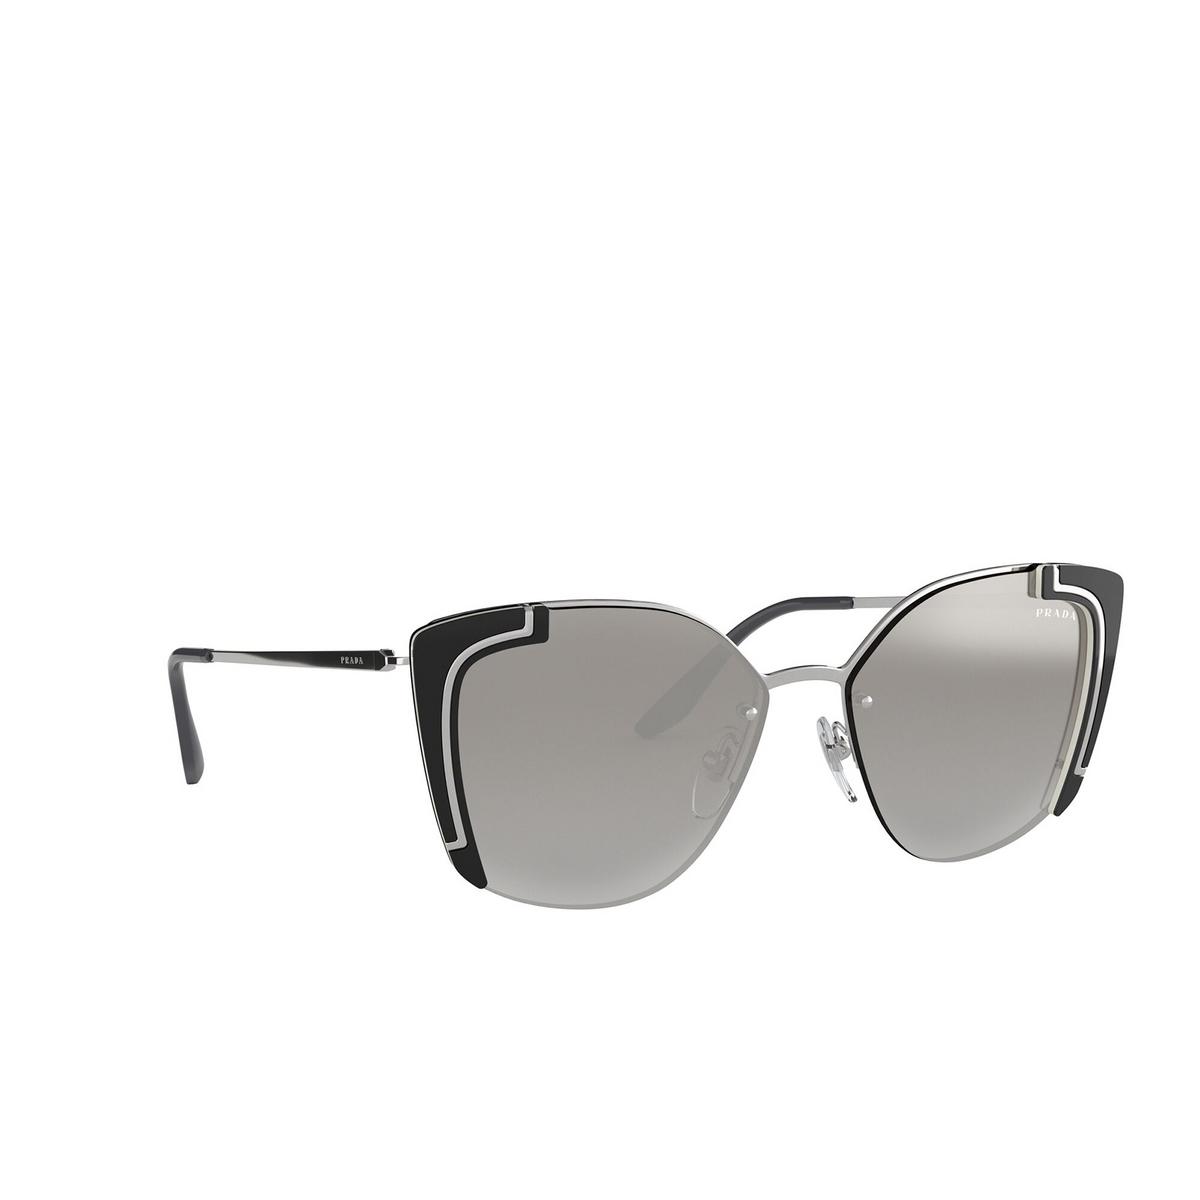 Prada® Butterfly Sunglasses: PR 59VS color Silver / Black Ivory 4315O0 - three-quarters view.